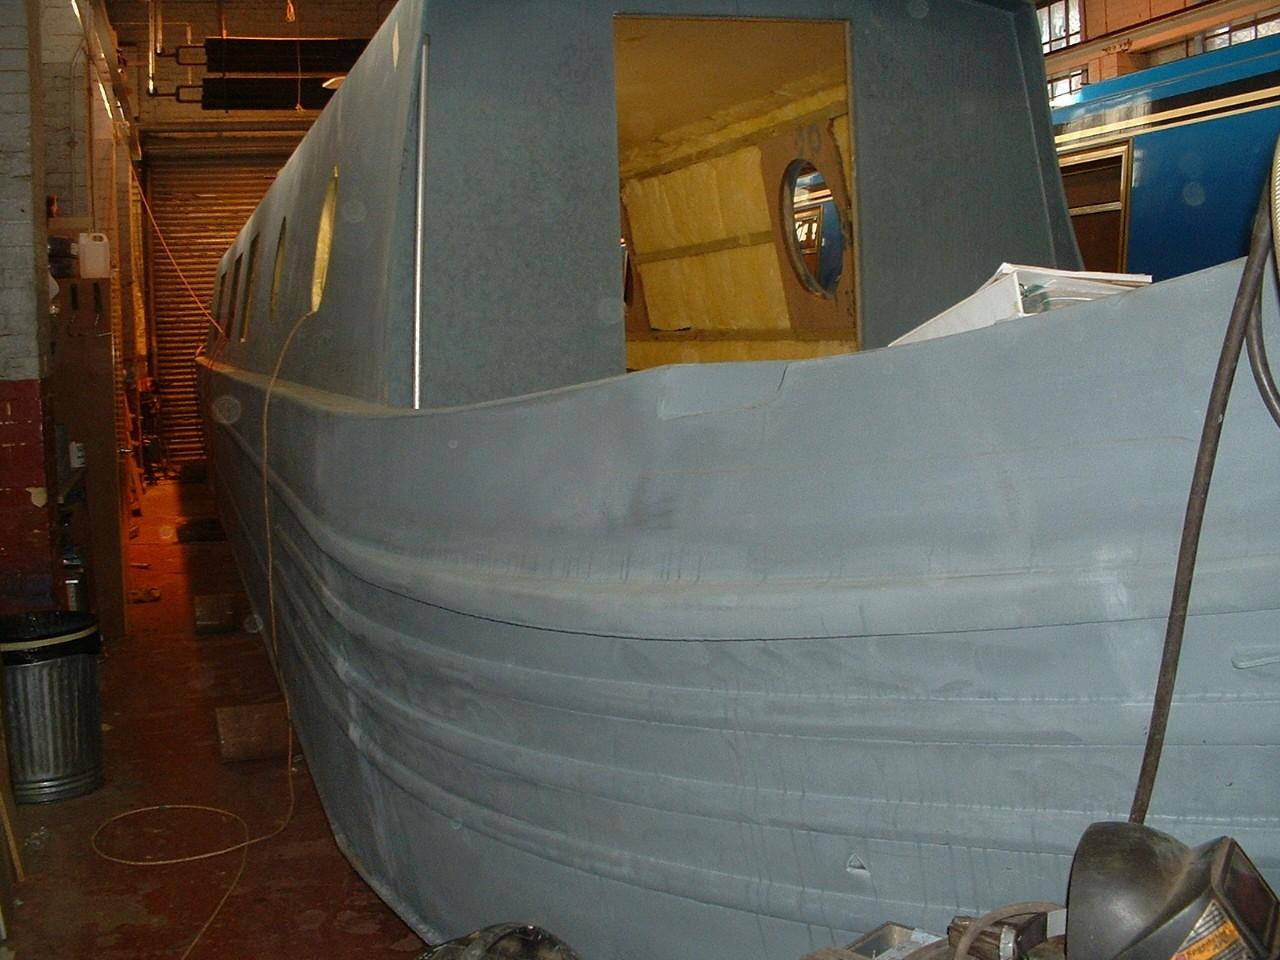 New-build narrow boat - Kinglsground - bow view - Copy